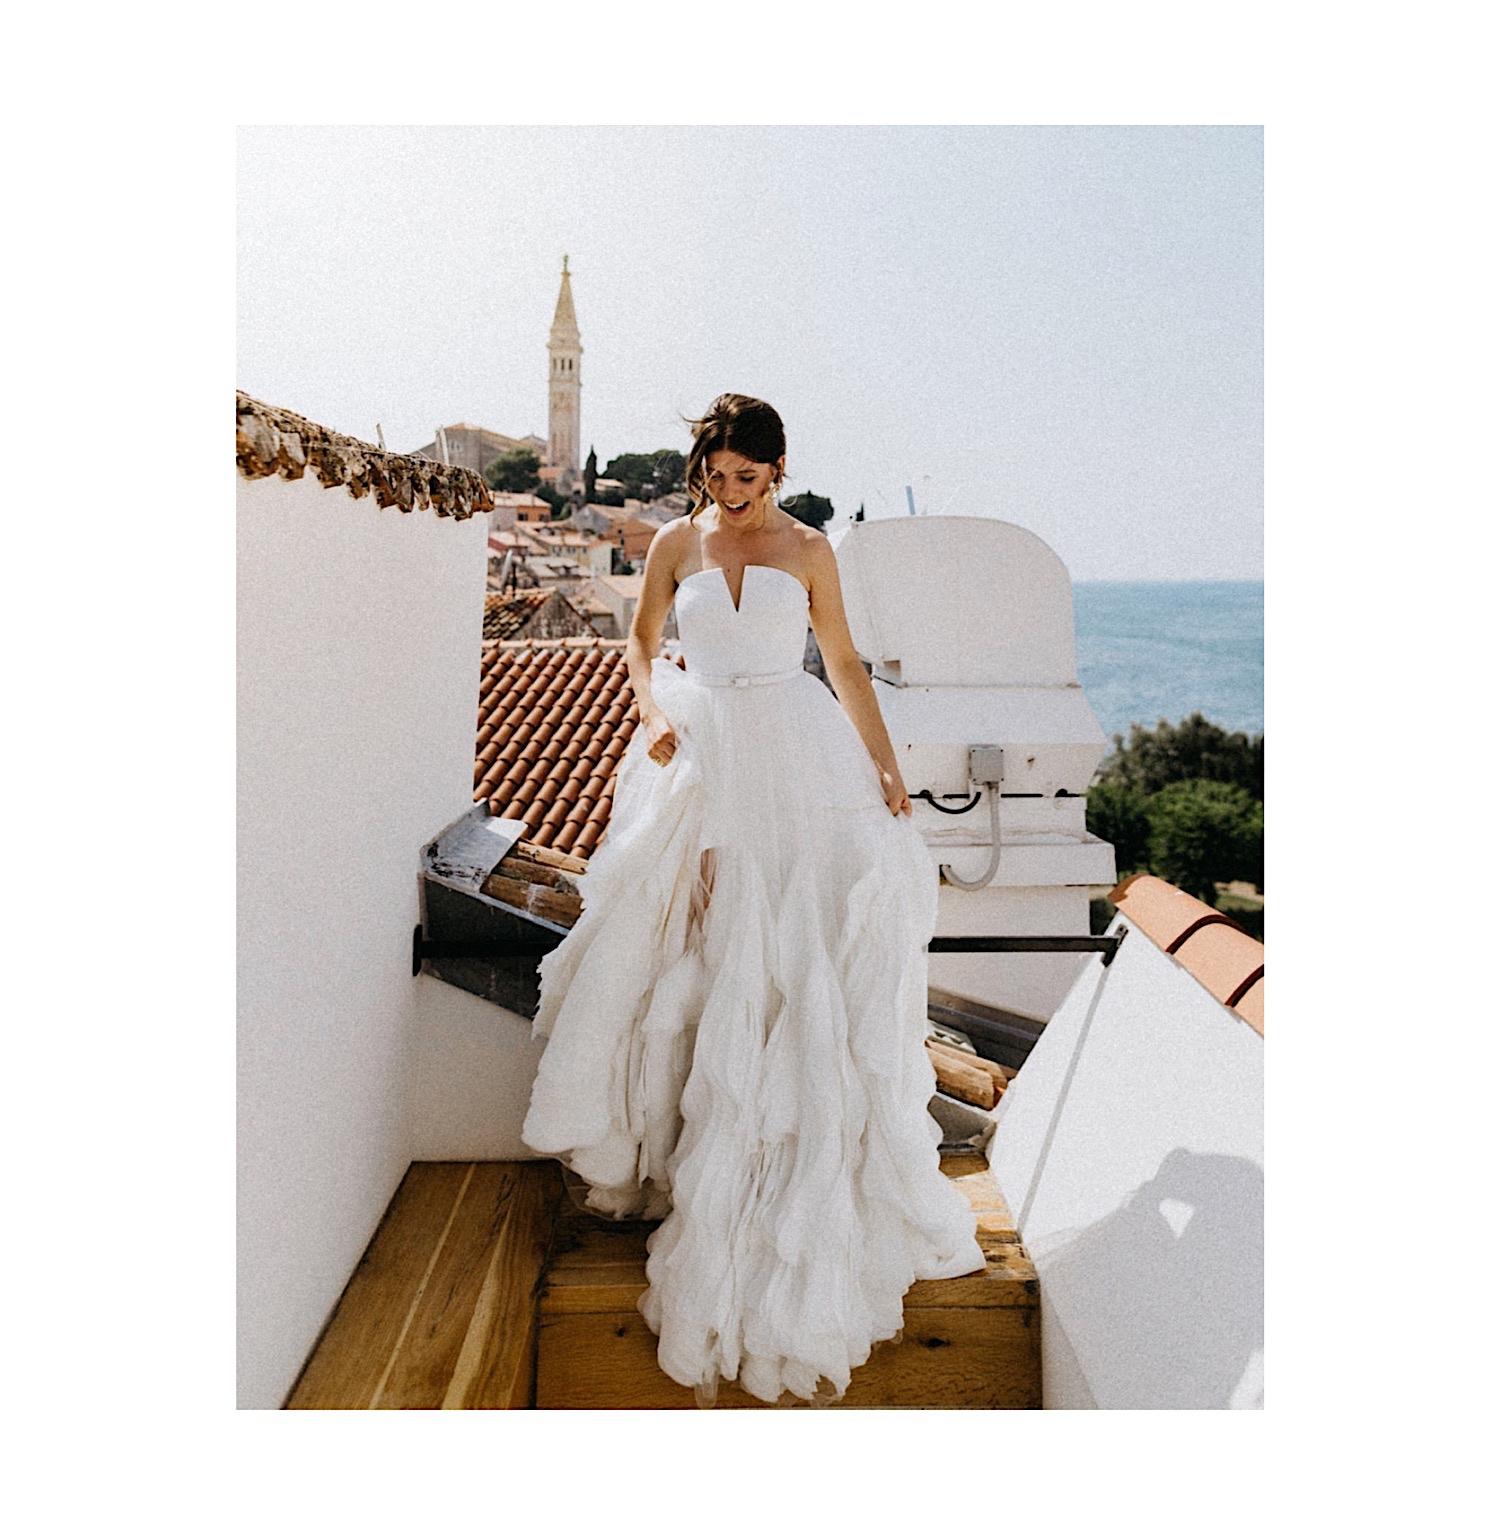 rovinj wedding croatia